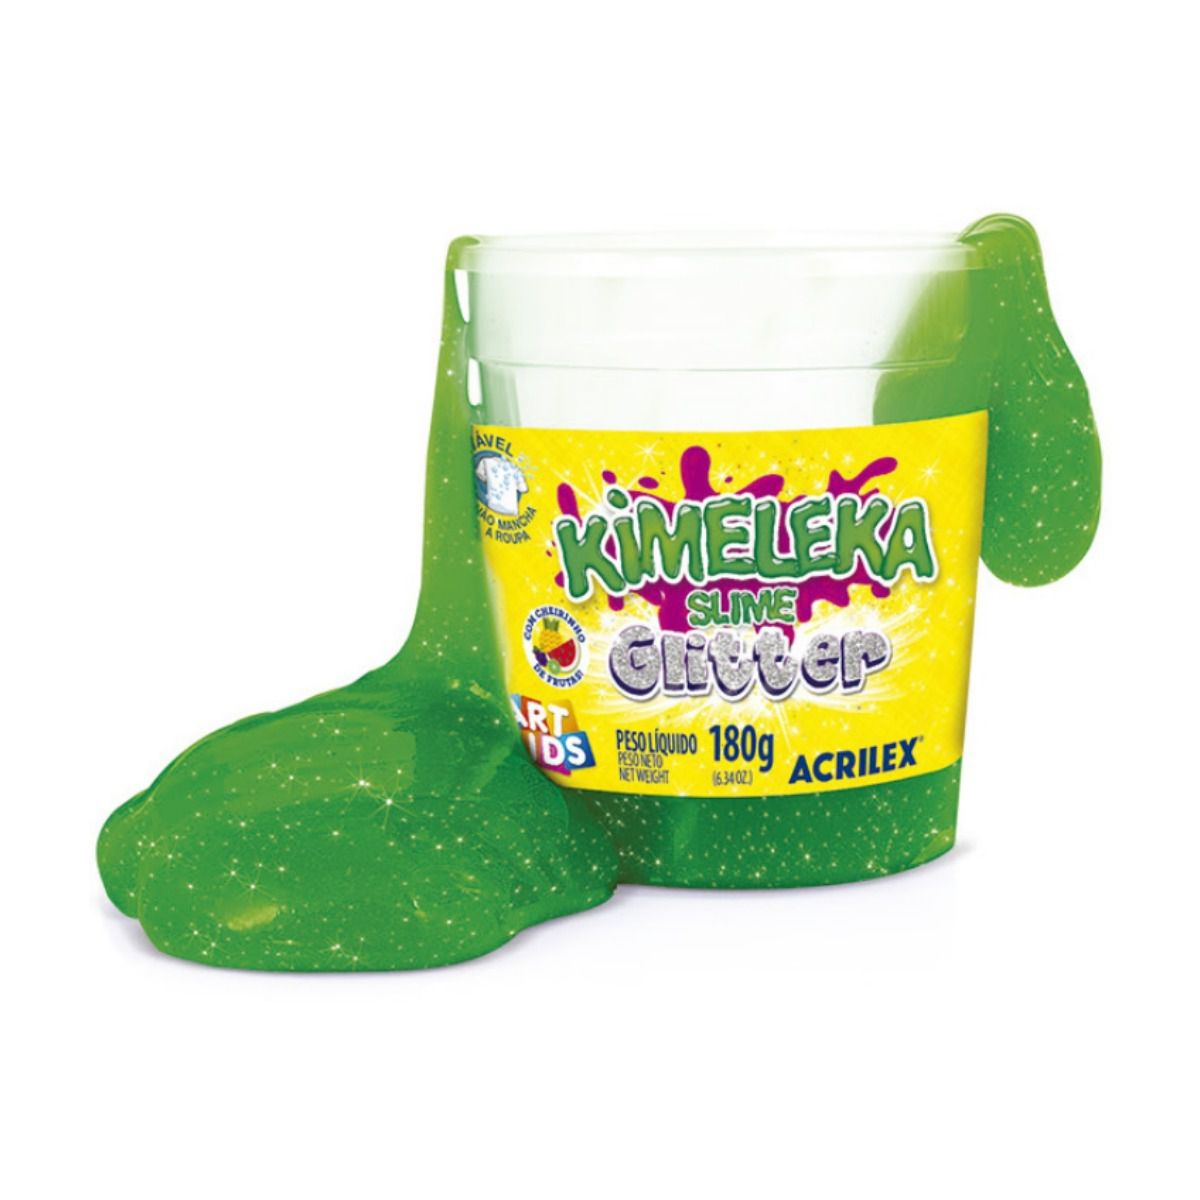 Slime Glitter Caixa com 12 unidades 180g Kimeleka Acrilex